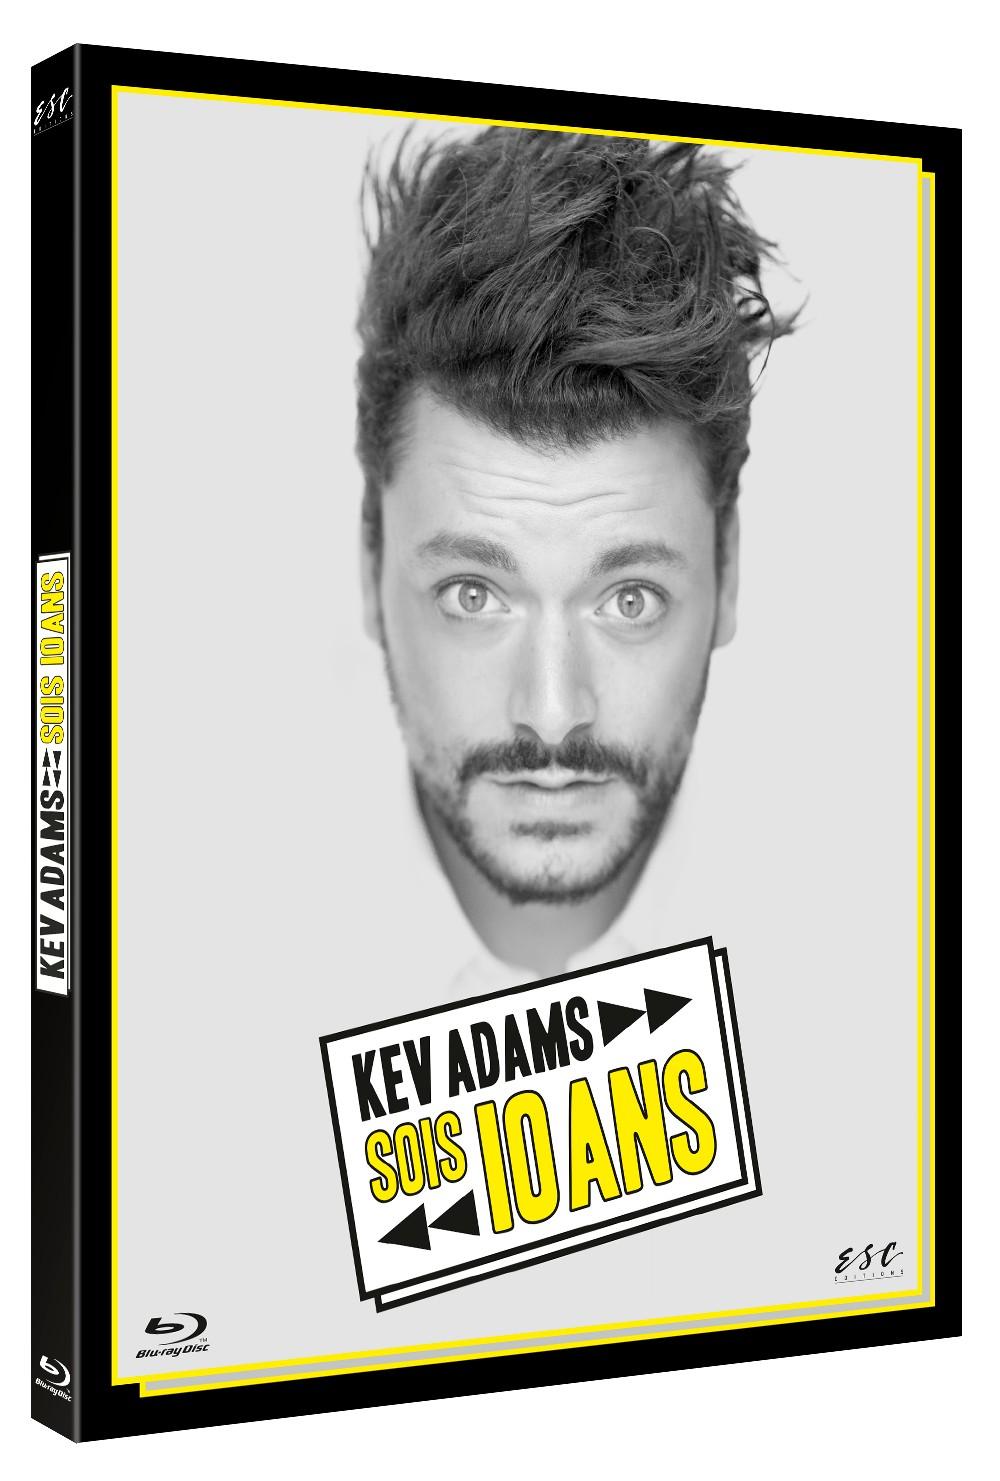 KEV ADAMS SOIS 10 ANS - BRD